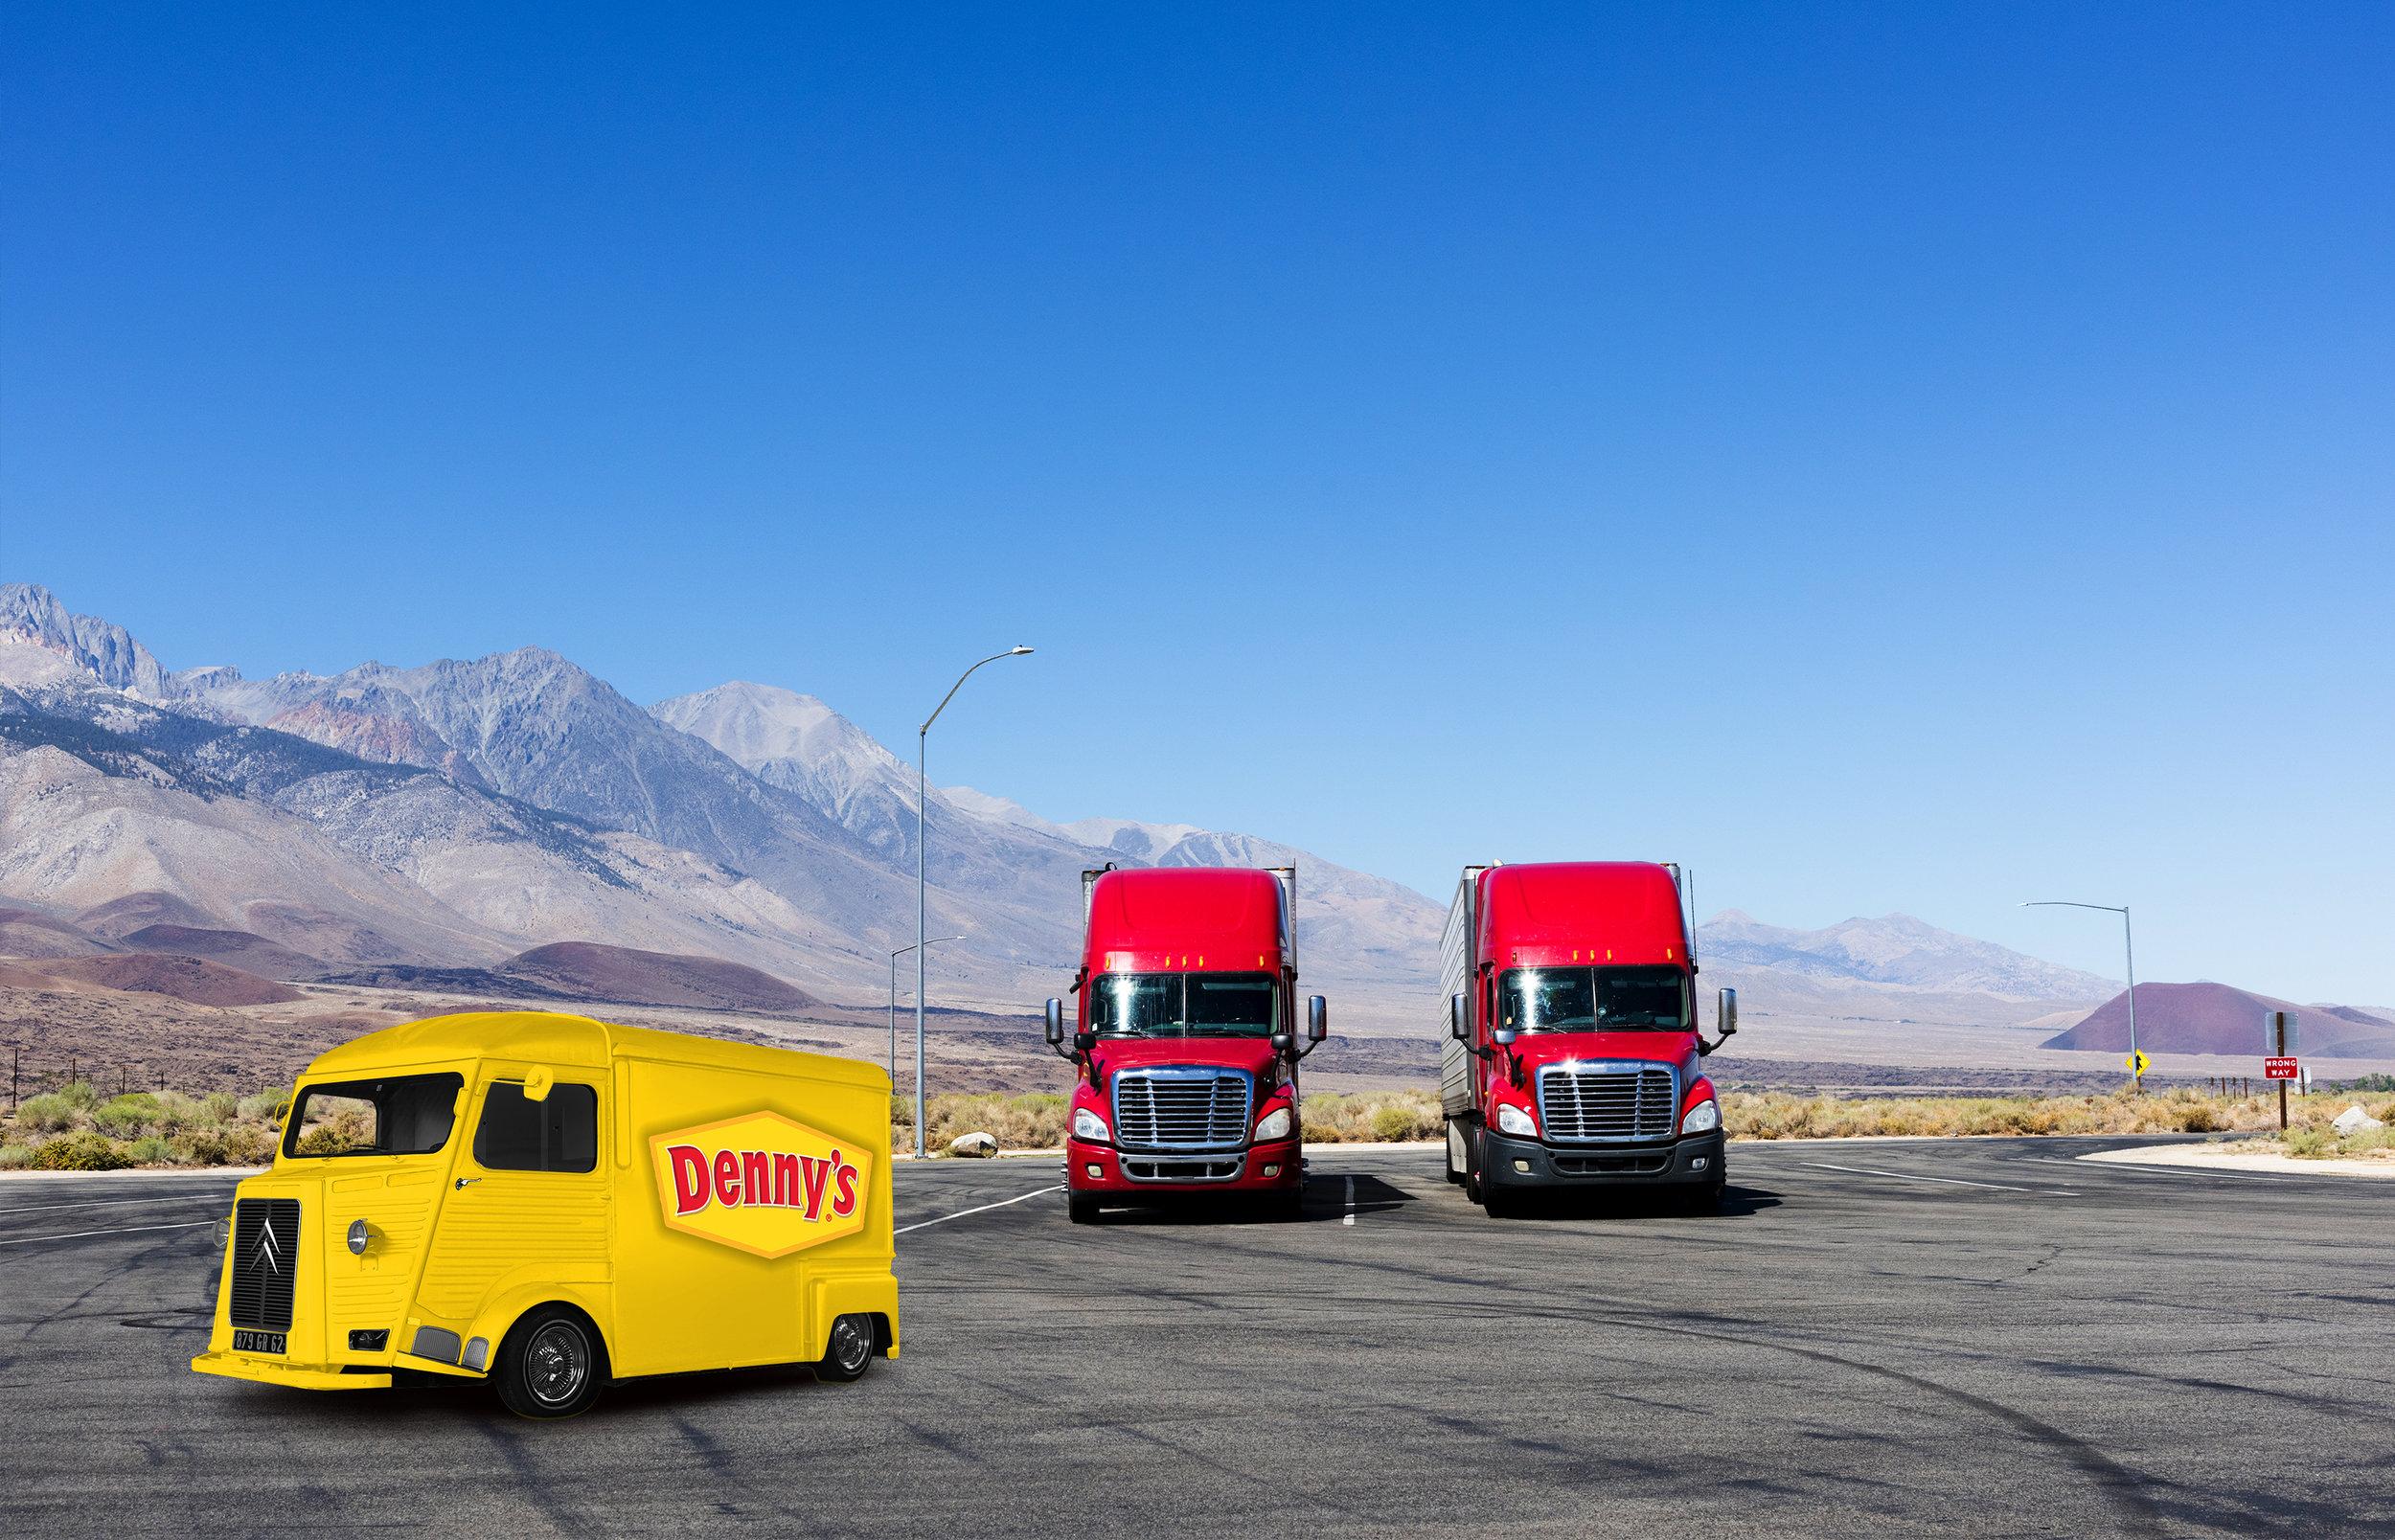 dennys truck setup2.jpg